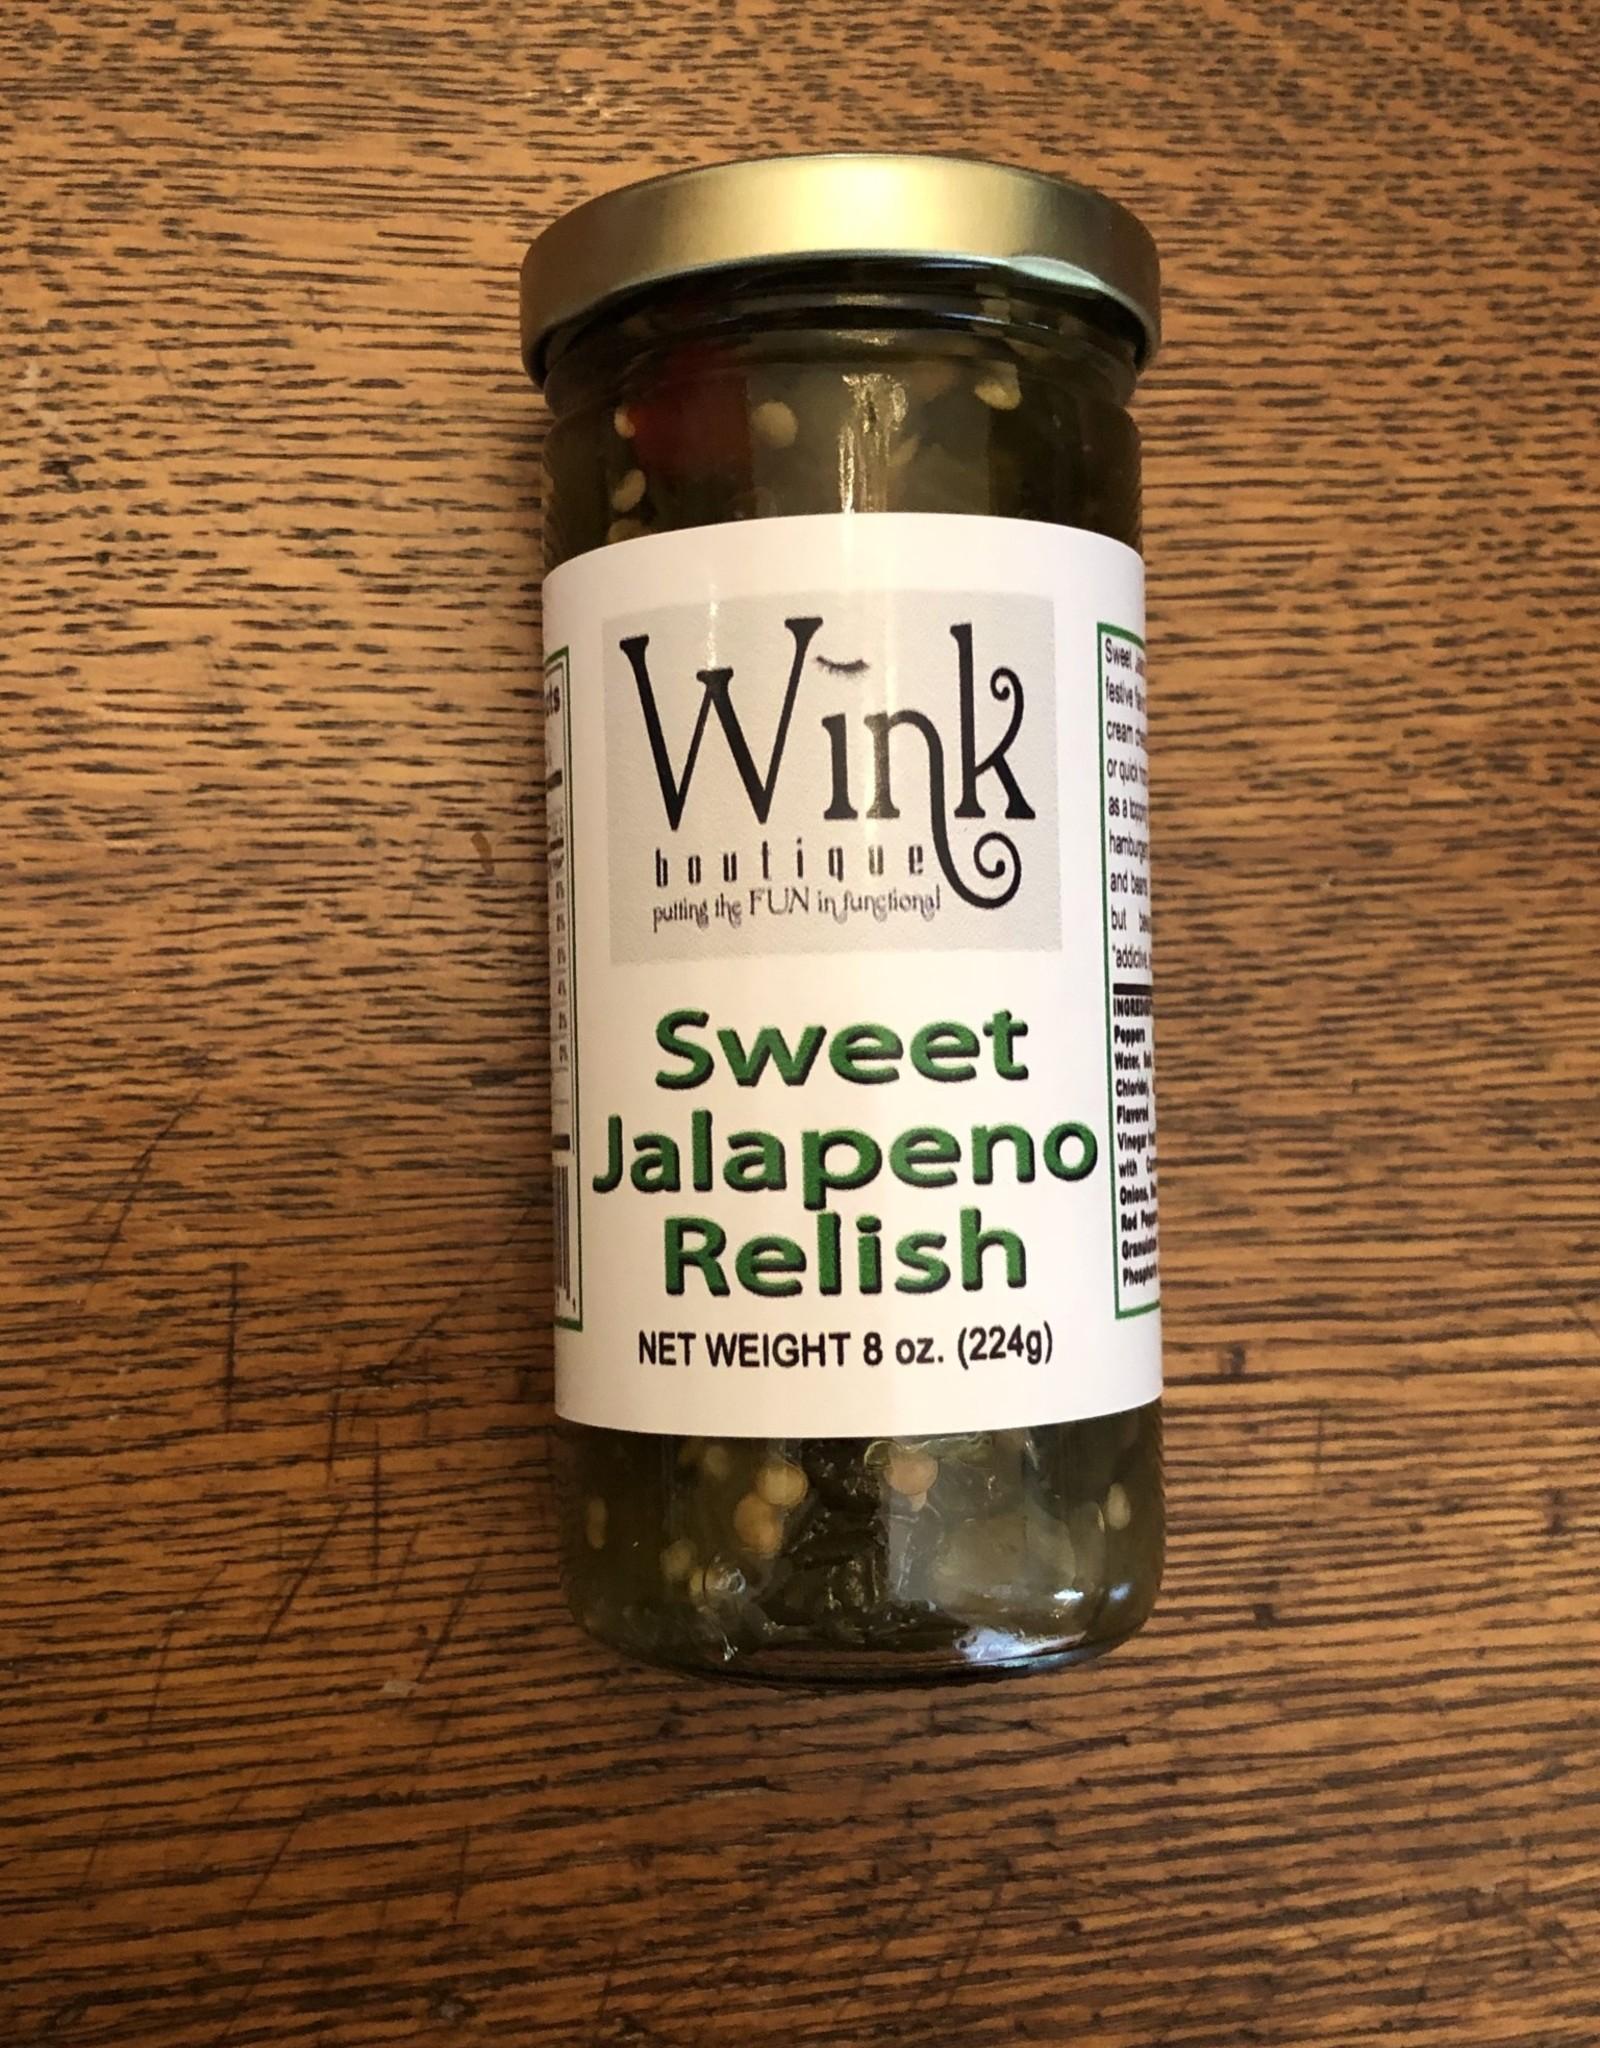 Wink Sweet Jalapeno Relish